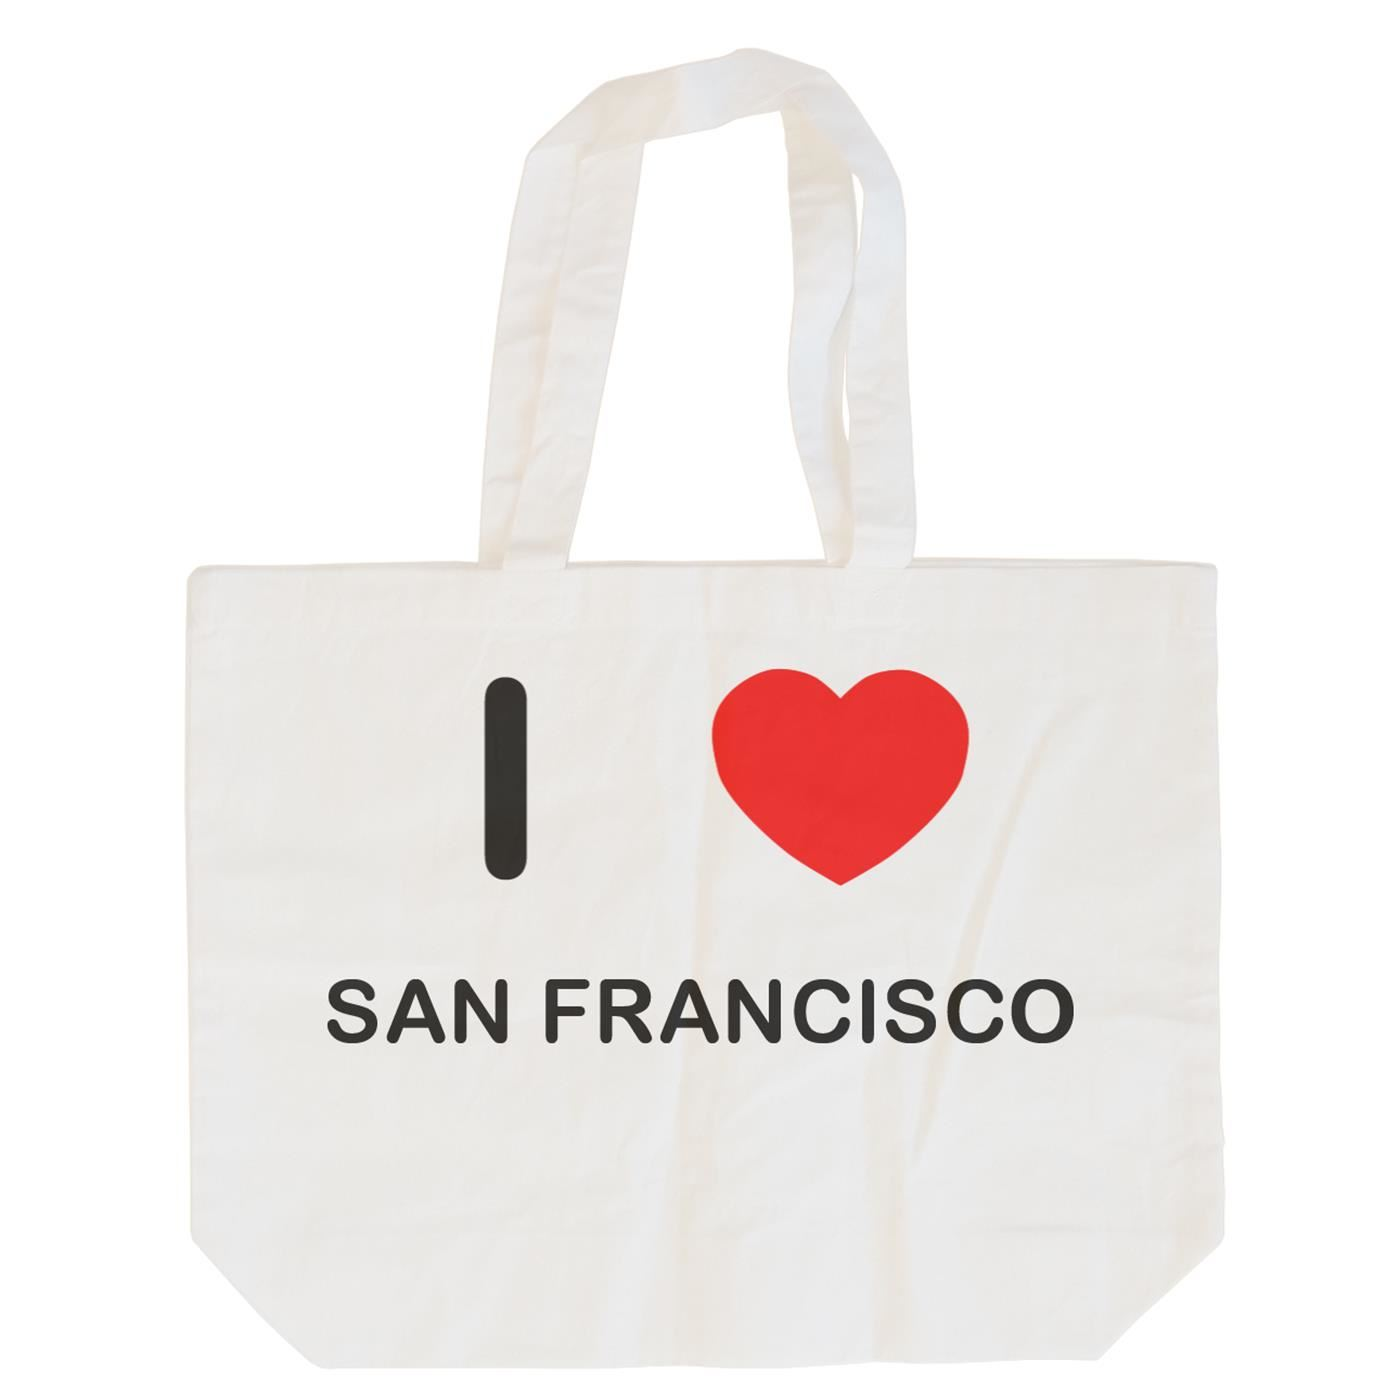 I Love San Francisco - Cotton Bag | Size choice Tote, Shopper or Sling